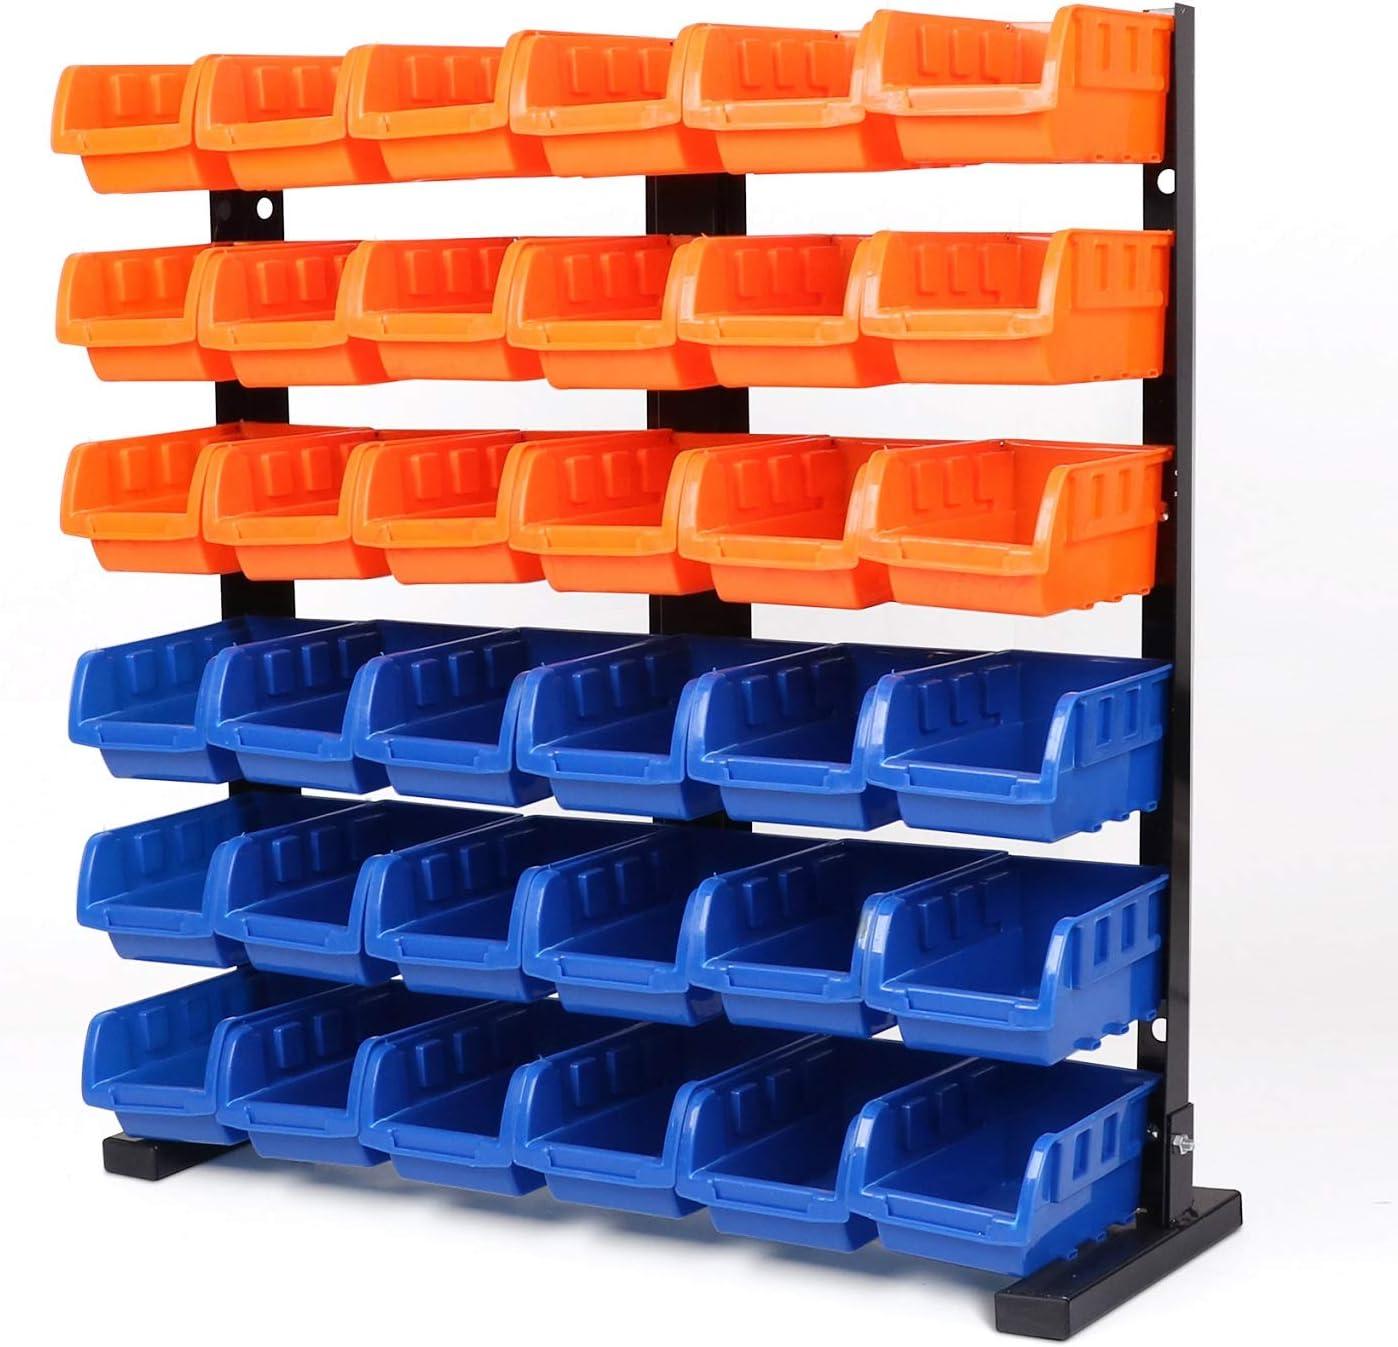 HORUSDY 36 Pcs Bin Storage Rack Shelving Garage Storage - Best Unique Tool Gift for Men